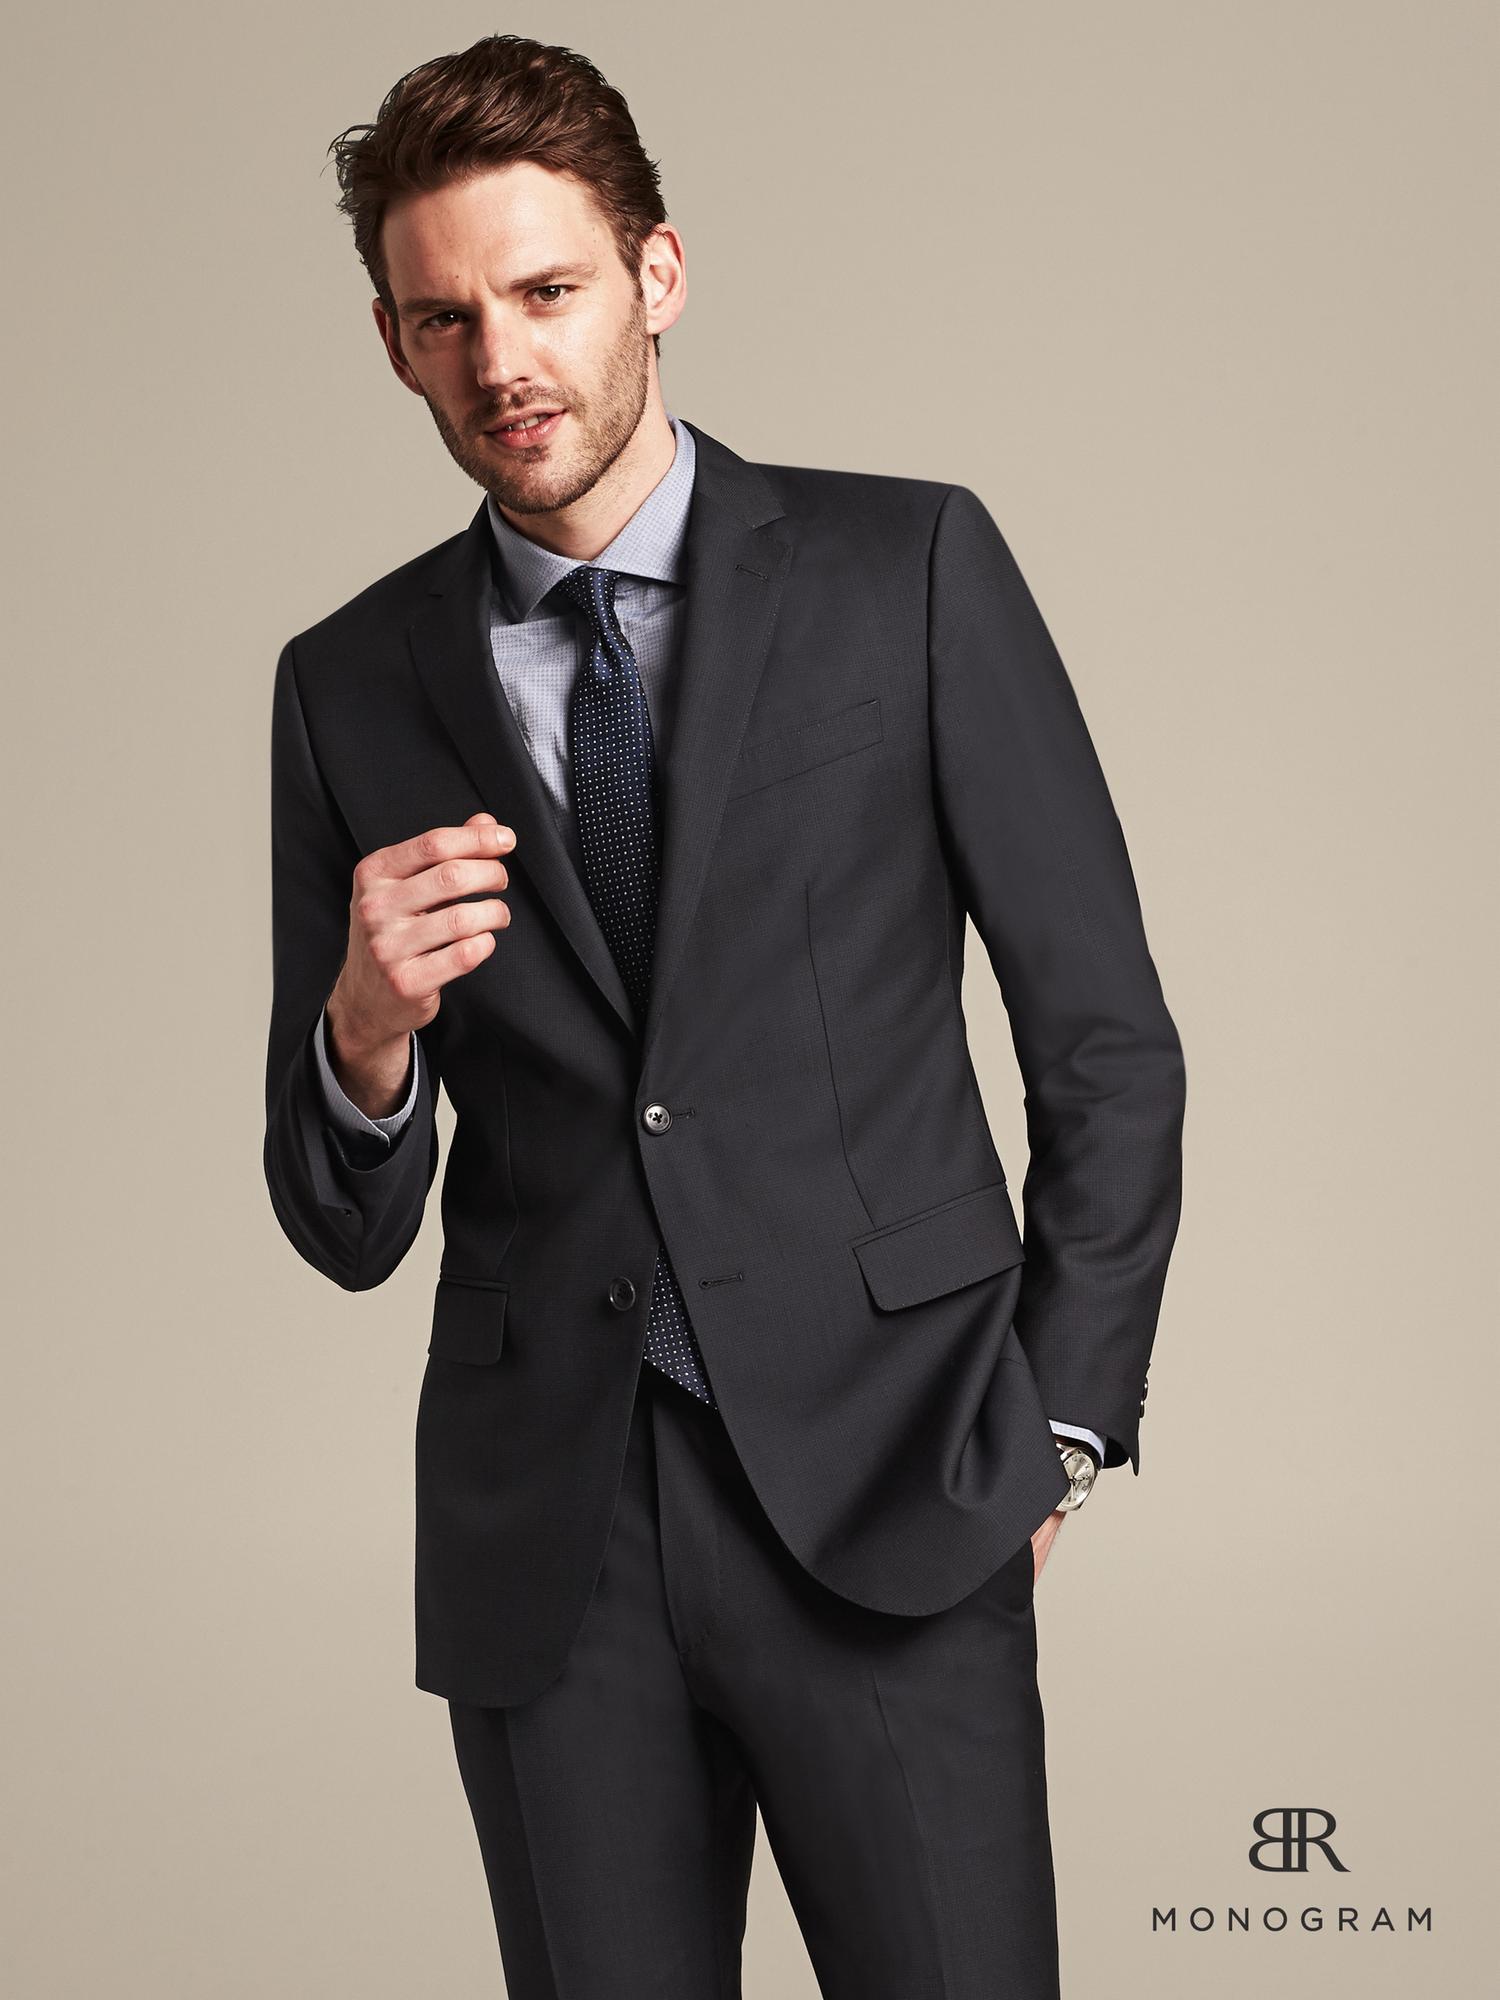 banana republic br monogram jacquard suit jacket in blue for men  navy